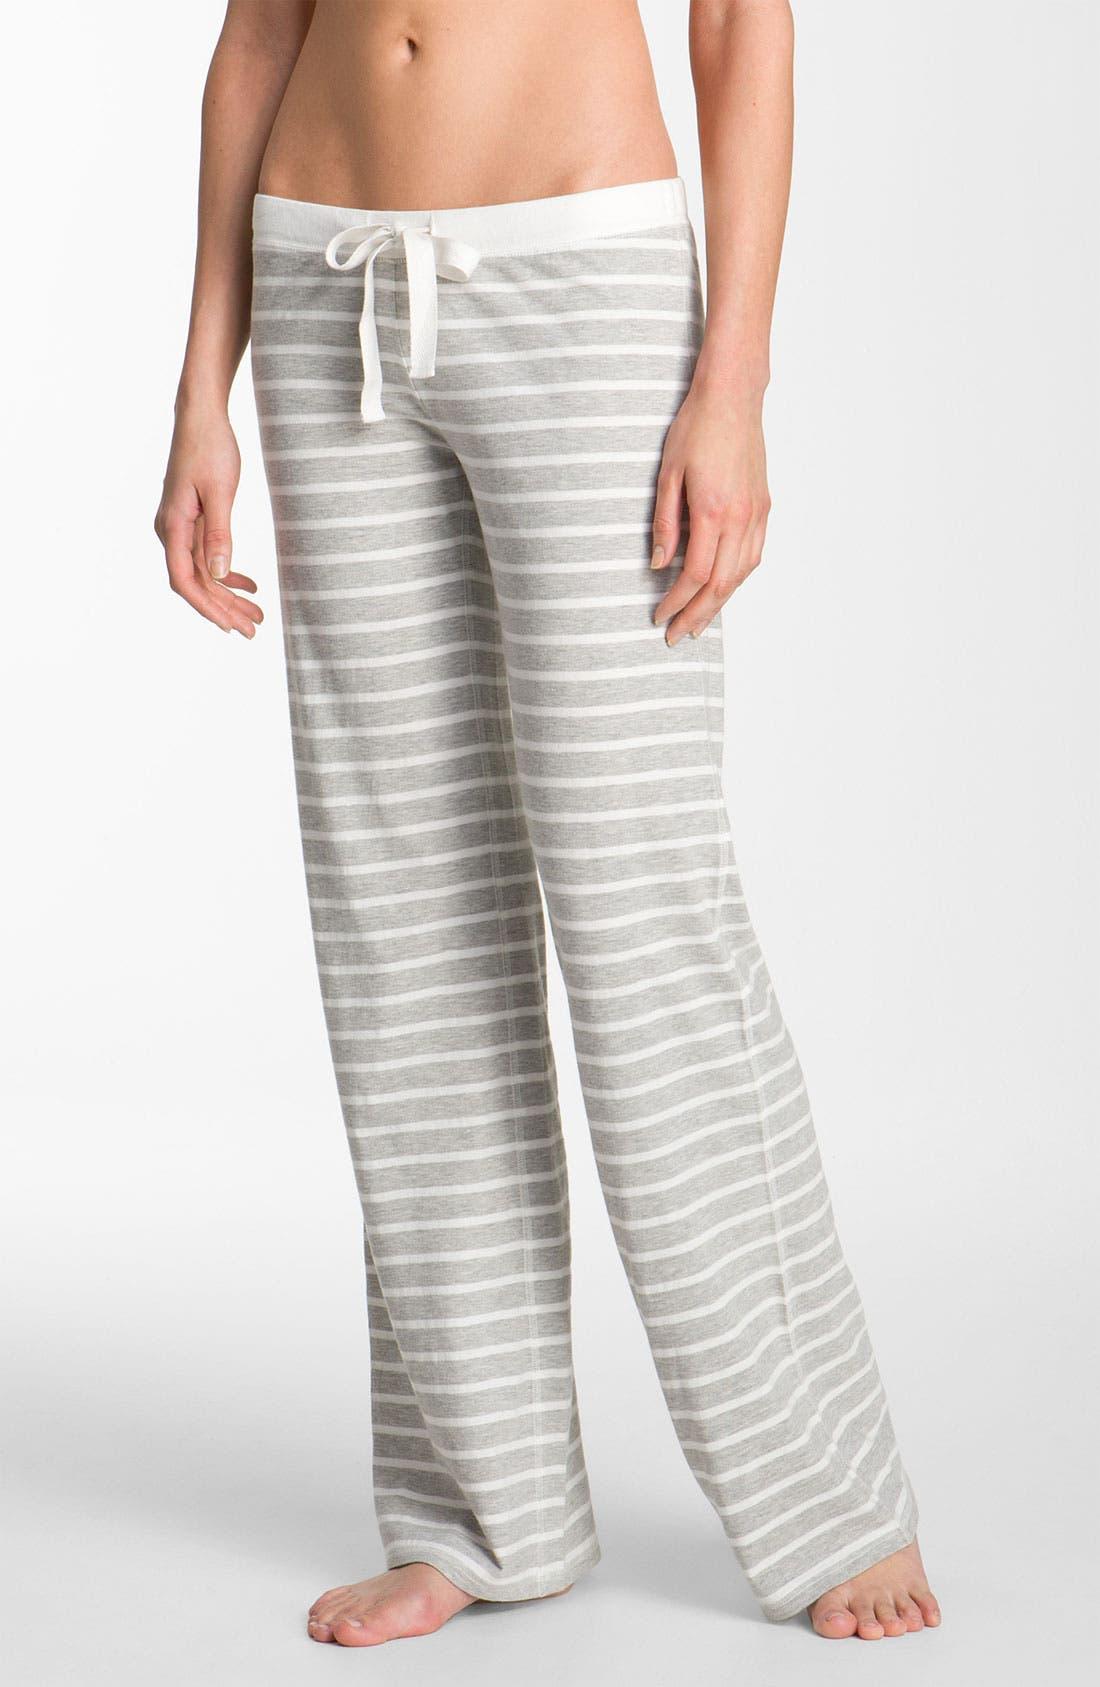 Alternate Image 1 Selected - Make + Model 'Sleepy Time' Lounge Pants